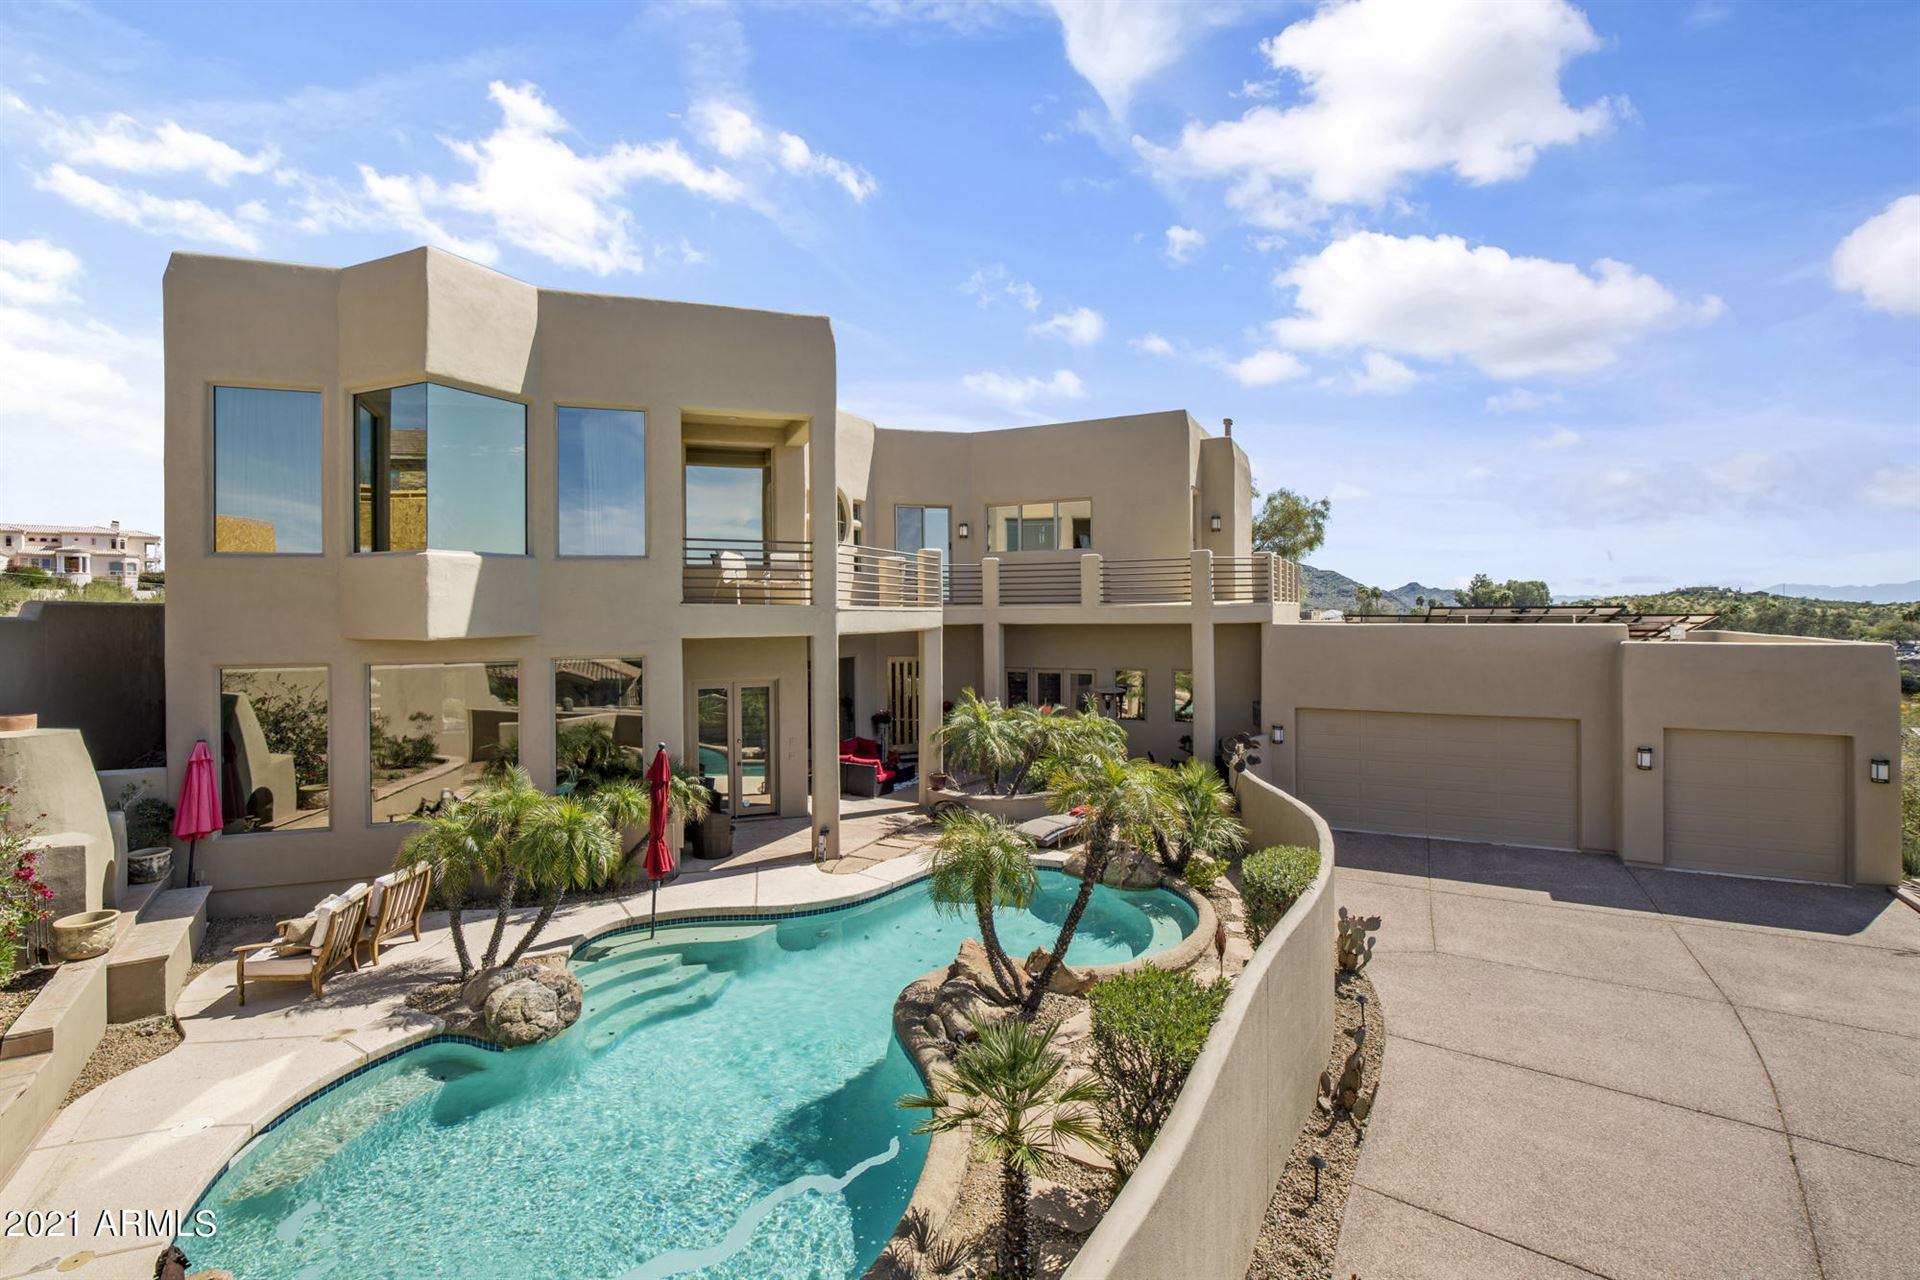 12653 N 17TH Place, Phoenix, AZ 85022 - MLS#: 6219448